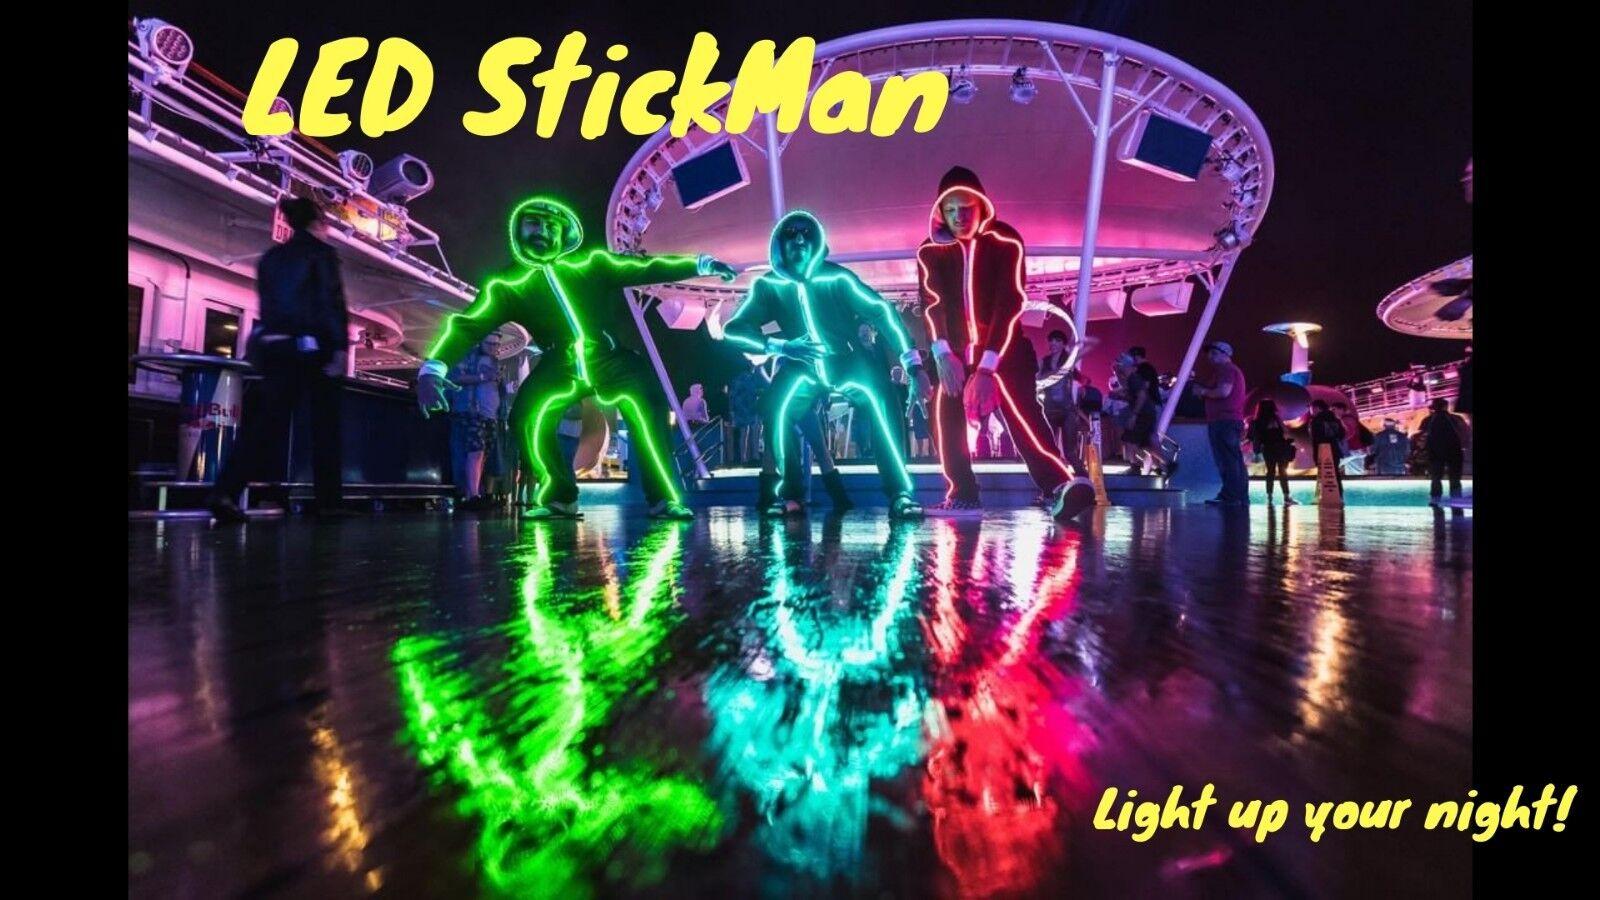 Halloween Costume - The LED StickMan